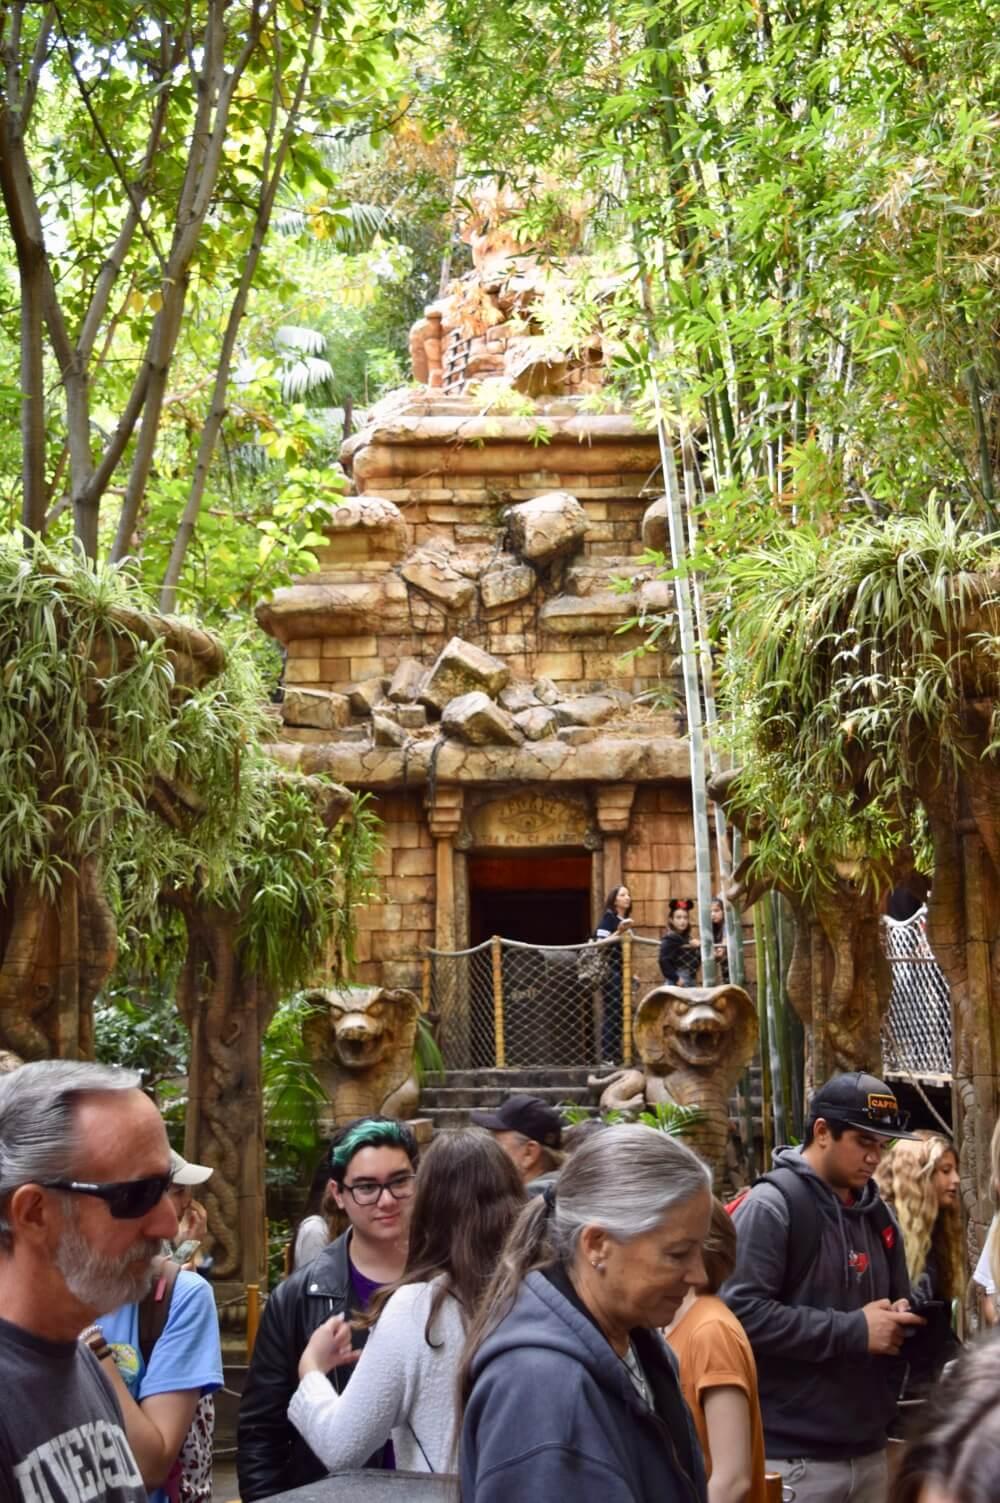 Best Queues at Disneyland - Indiana Jones Exterior